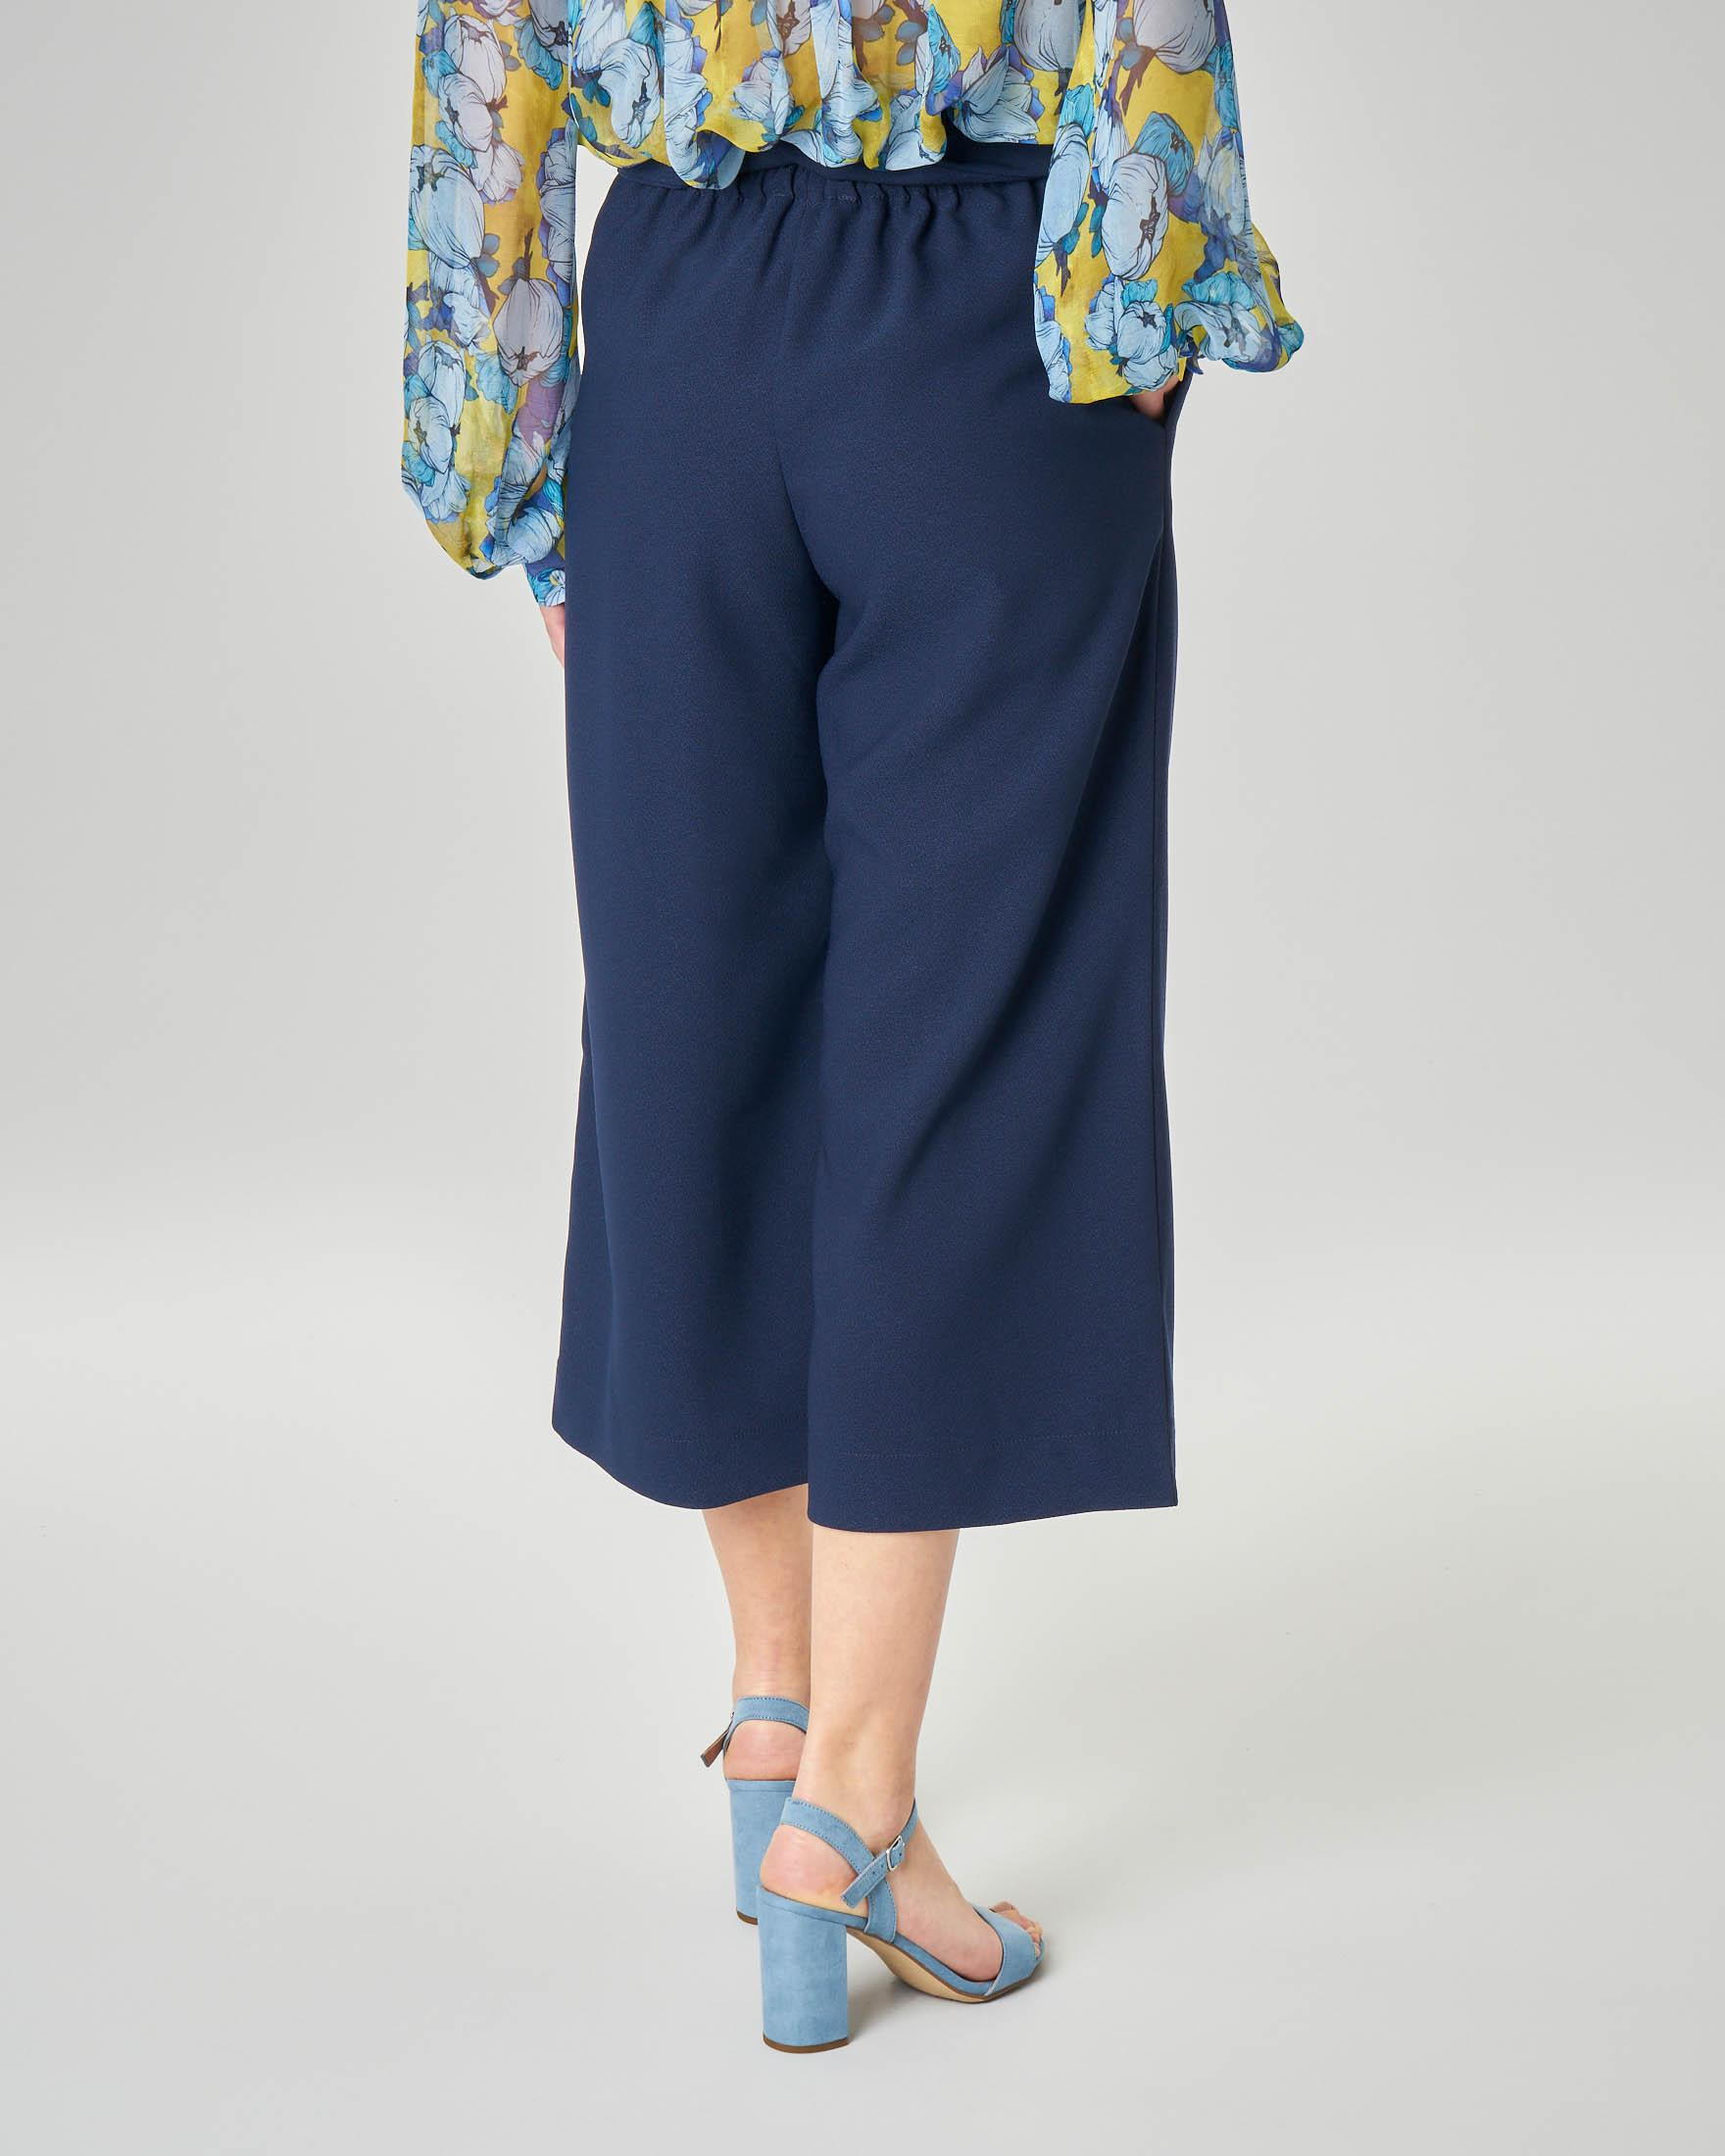 Pantalone culotte blu con fusciacca in vita